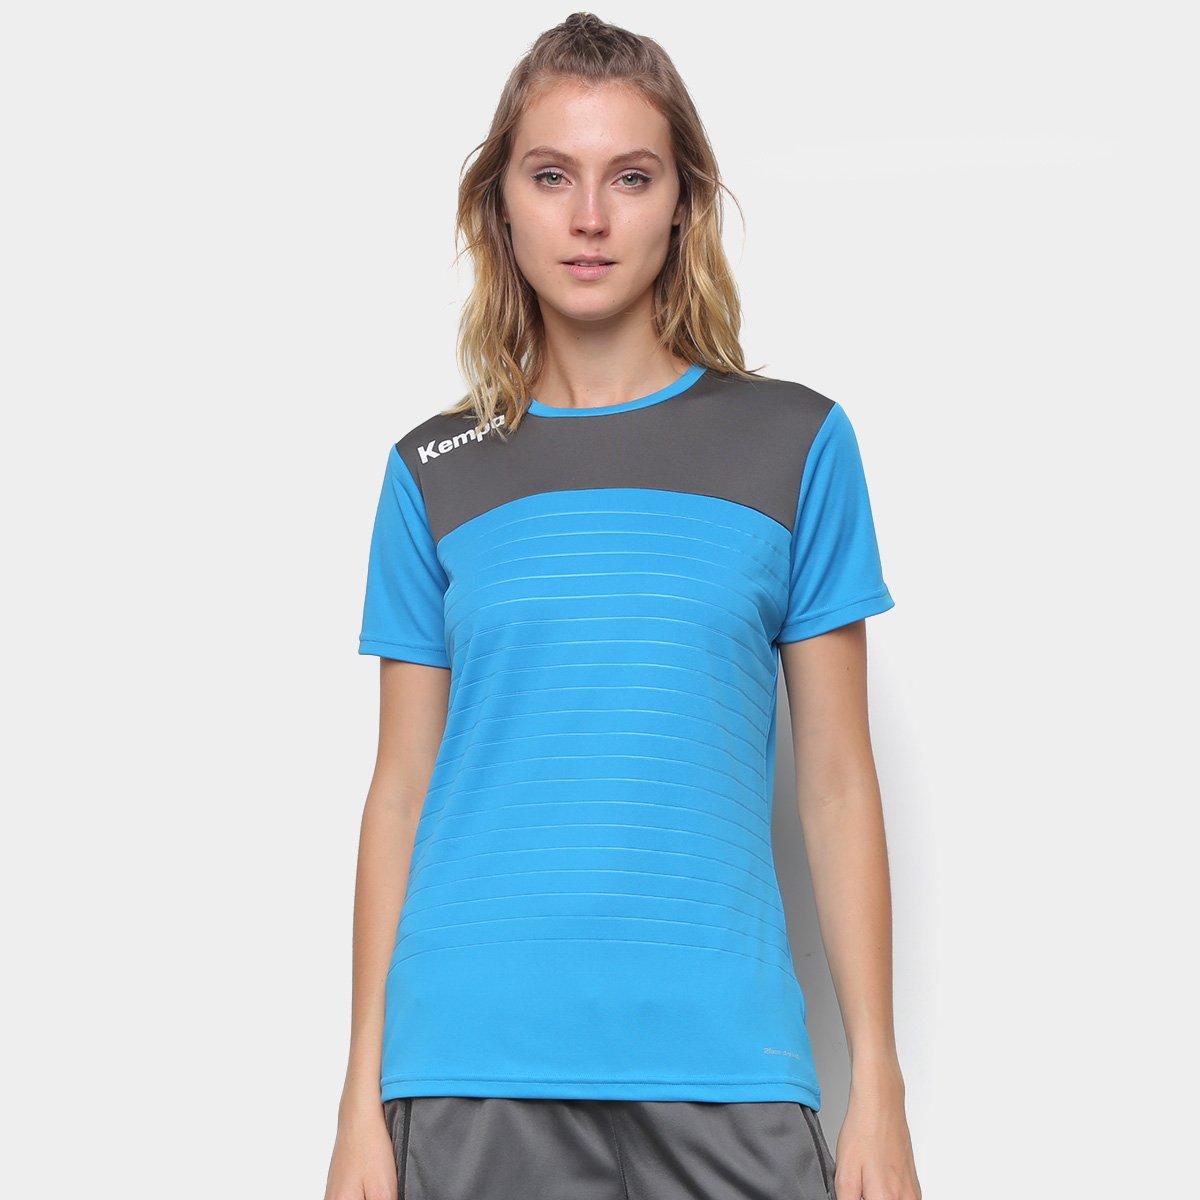 Camiseta de Treino Kempa Emotion 2.0 Feminina